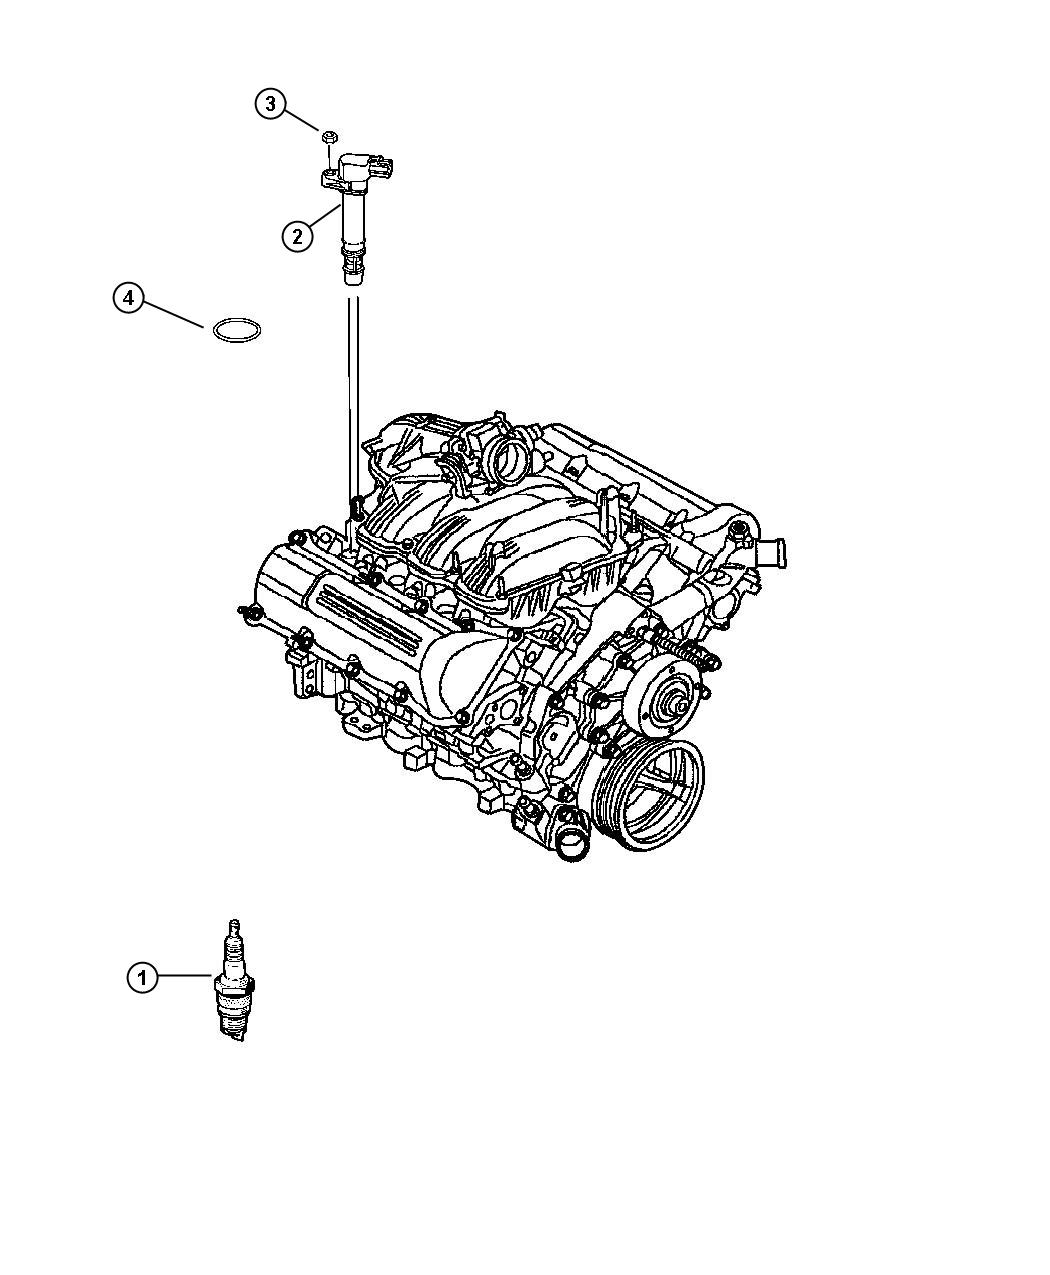 Dodge Dakota Slt Quad Cab 4 7l V8 M T 4x4 Coil